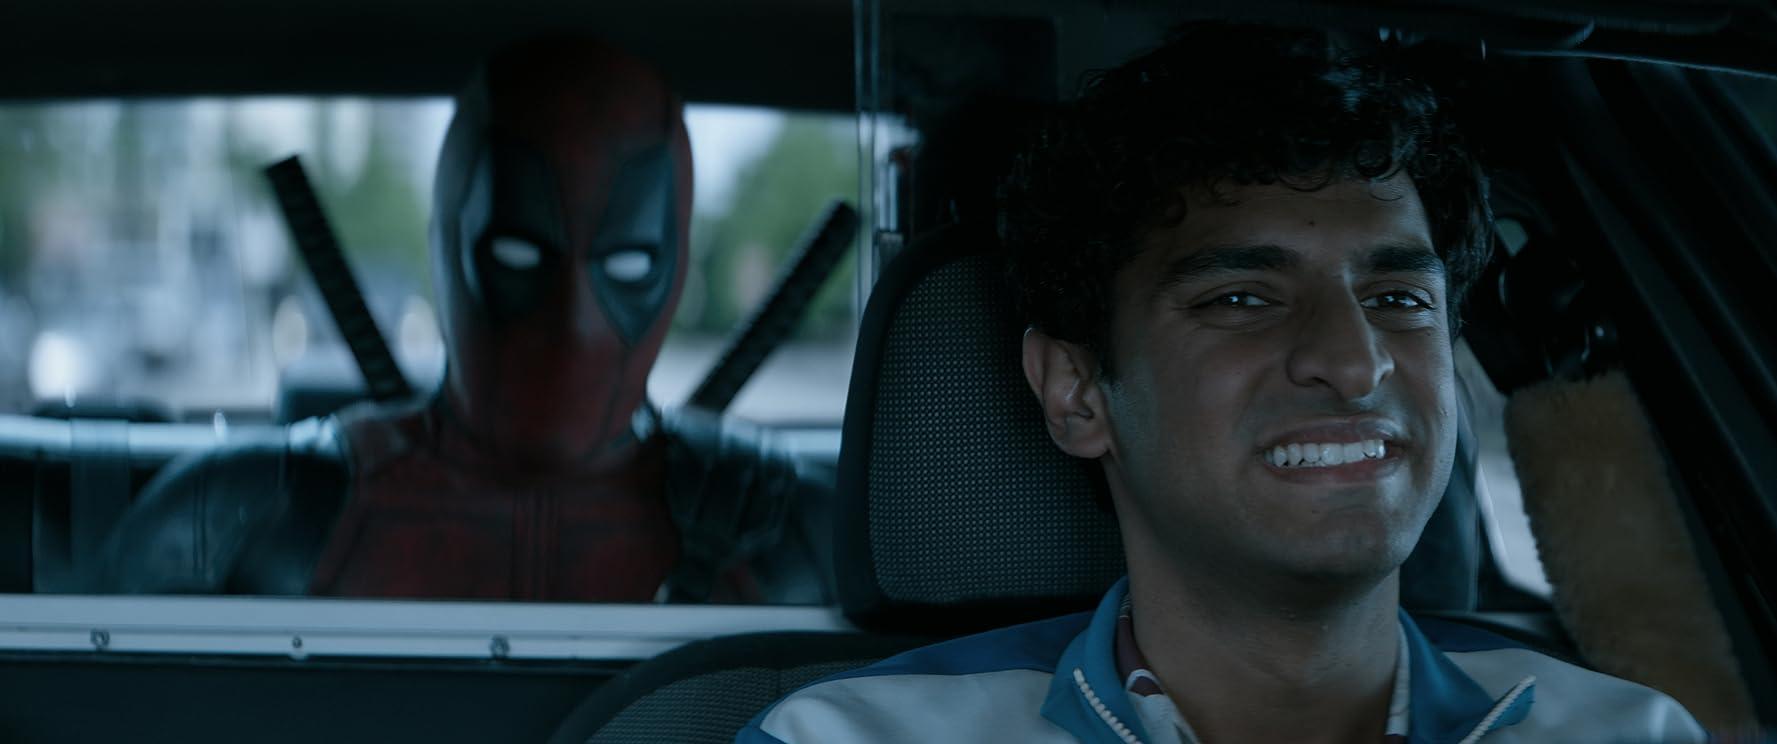 Ryan Reynolds and Karan Soni in Deadpool 2 (2018)